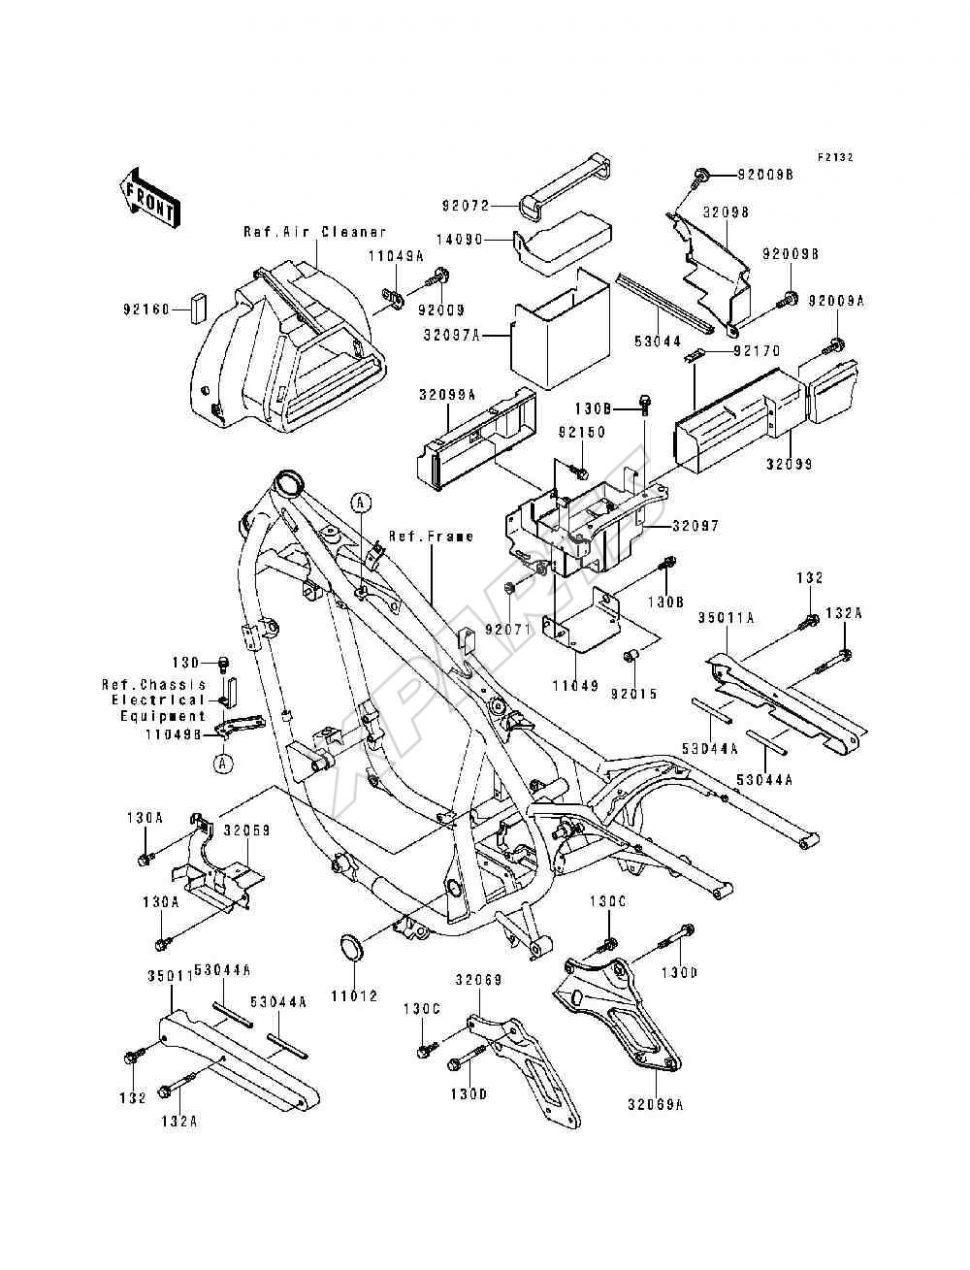 fender stratocaster jack plate wiring